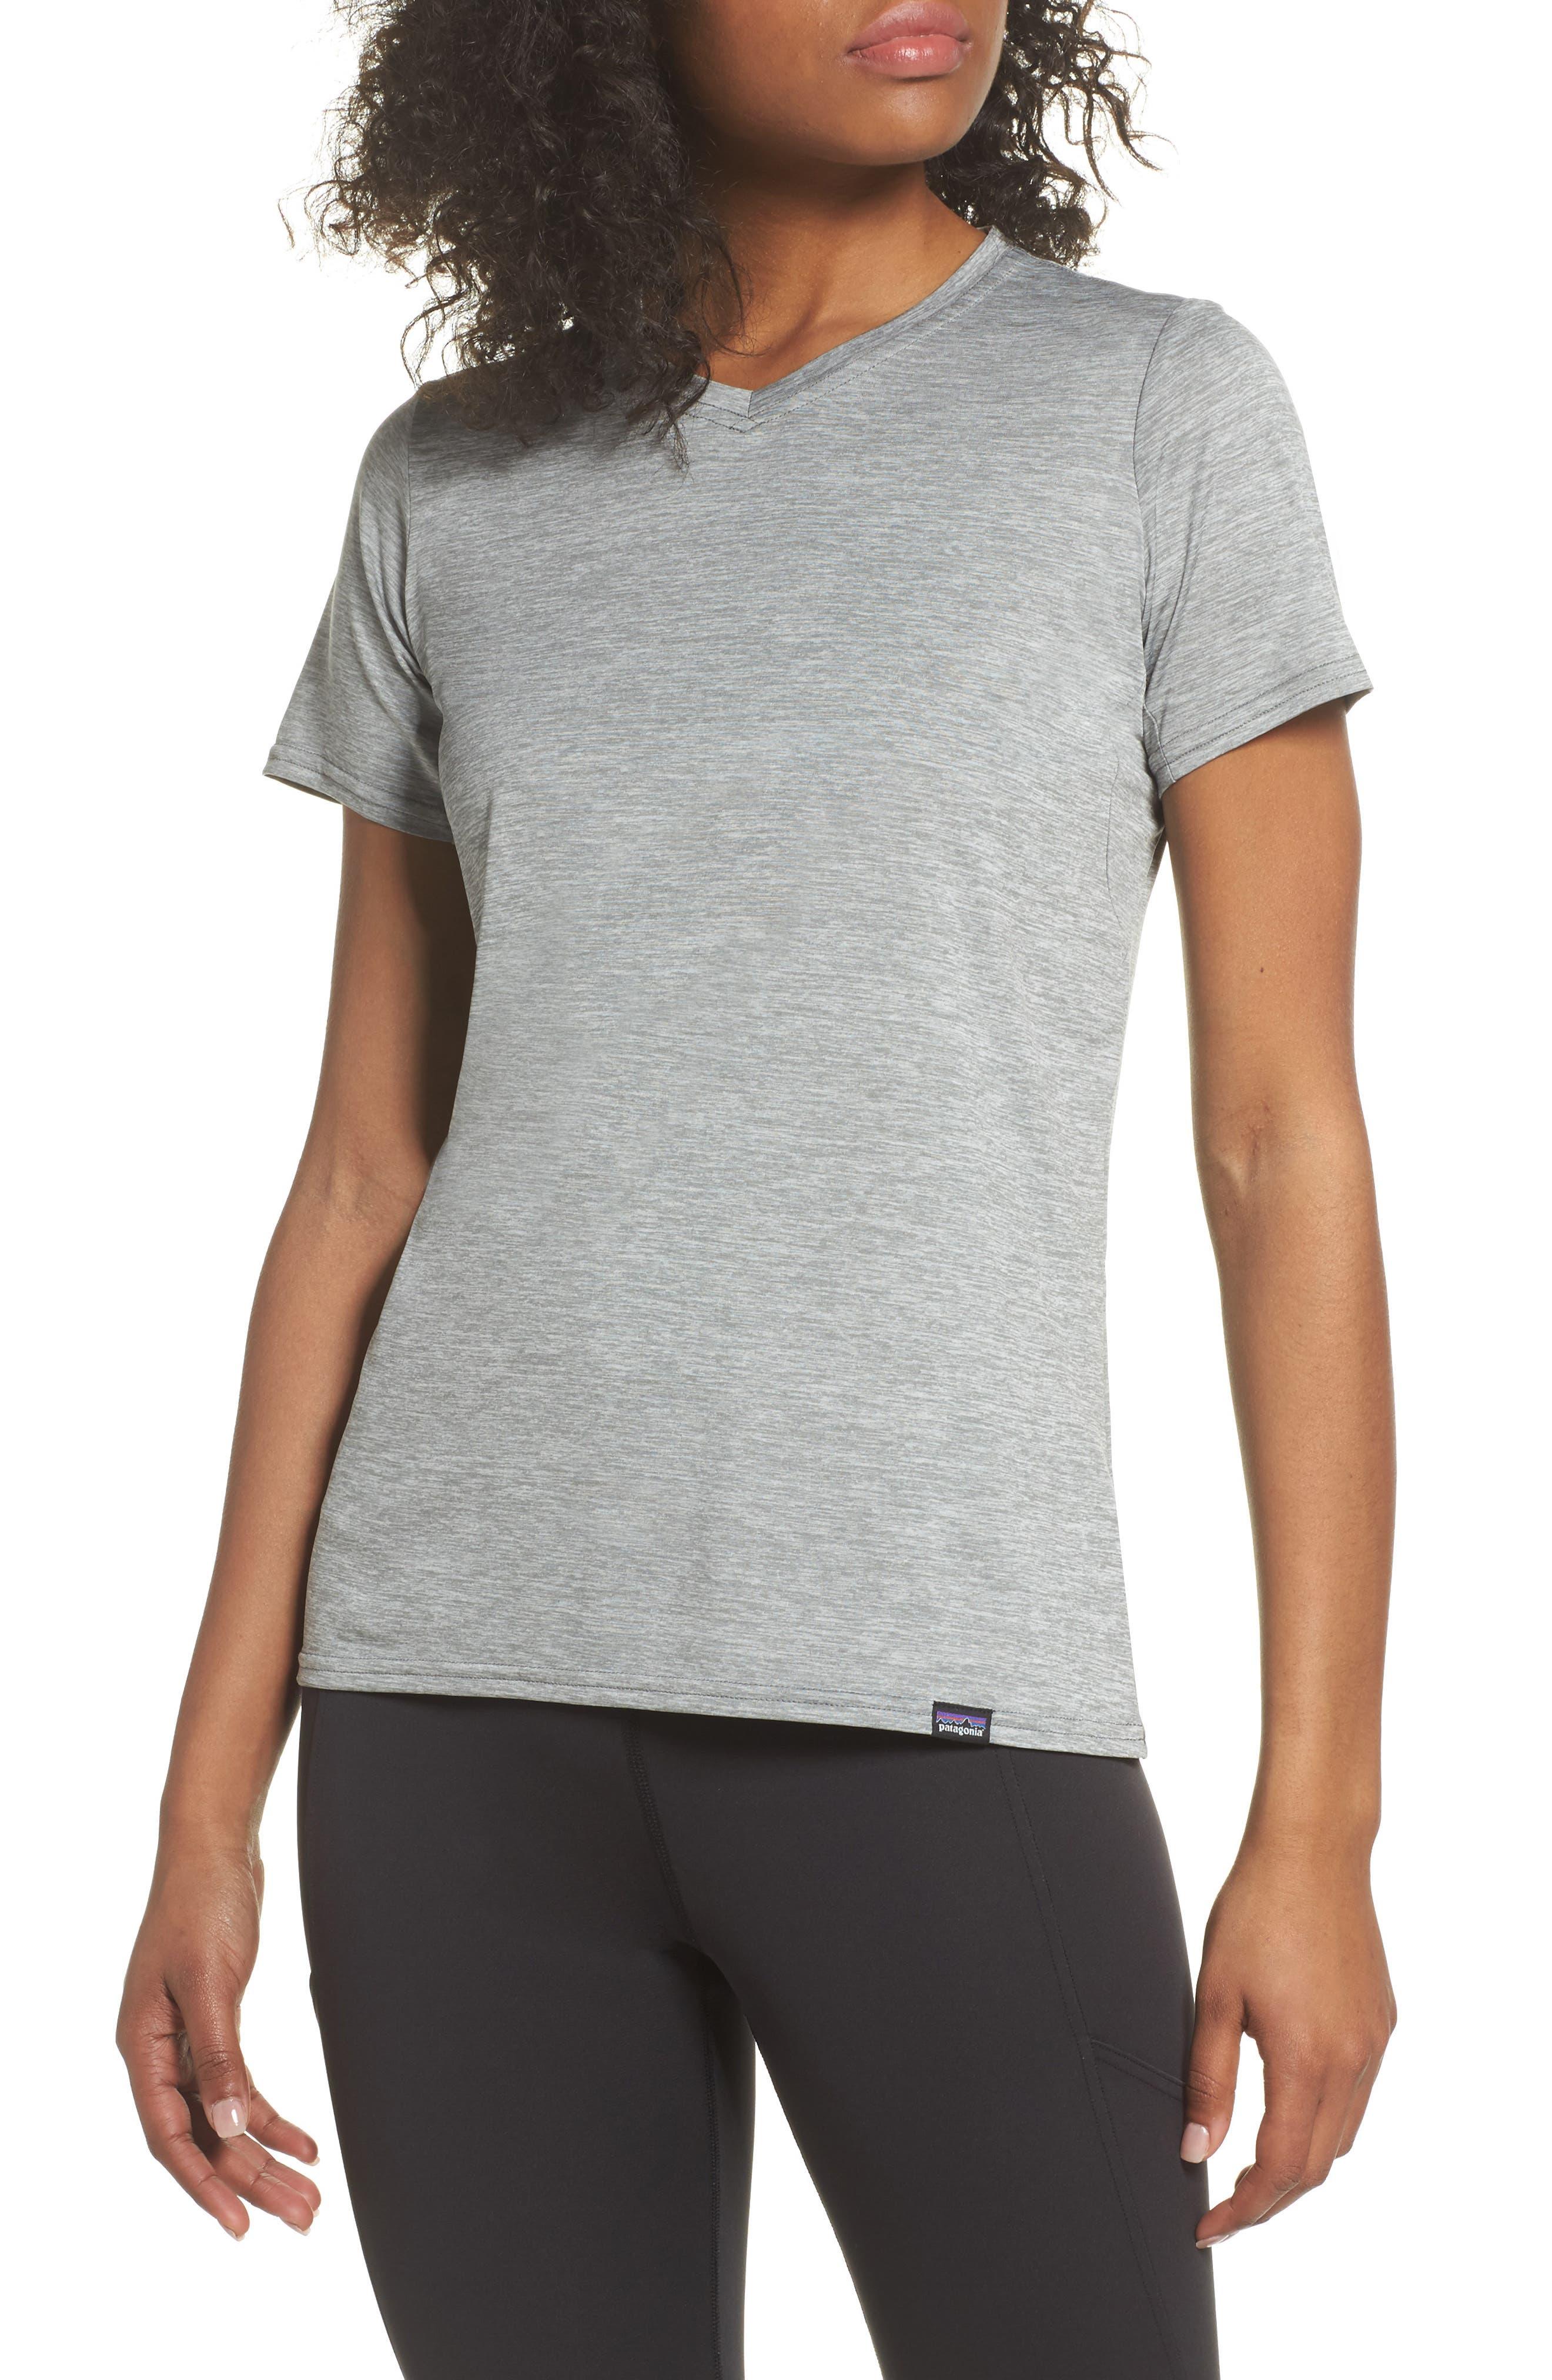 Capilene<sup>®</sup> Dailty T-Shirt,                         Main,                         color, Feather Grey